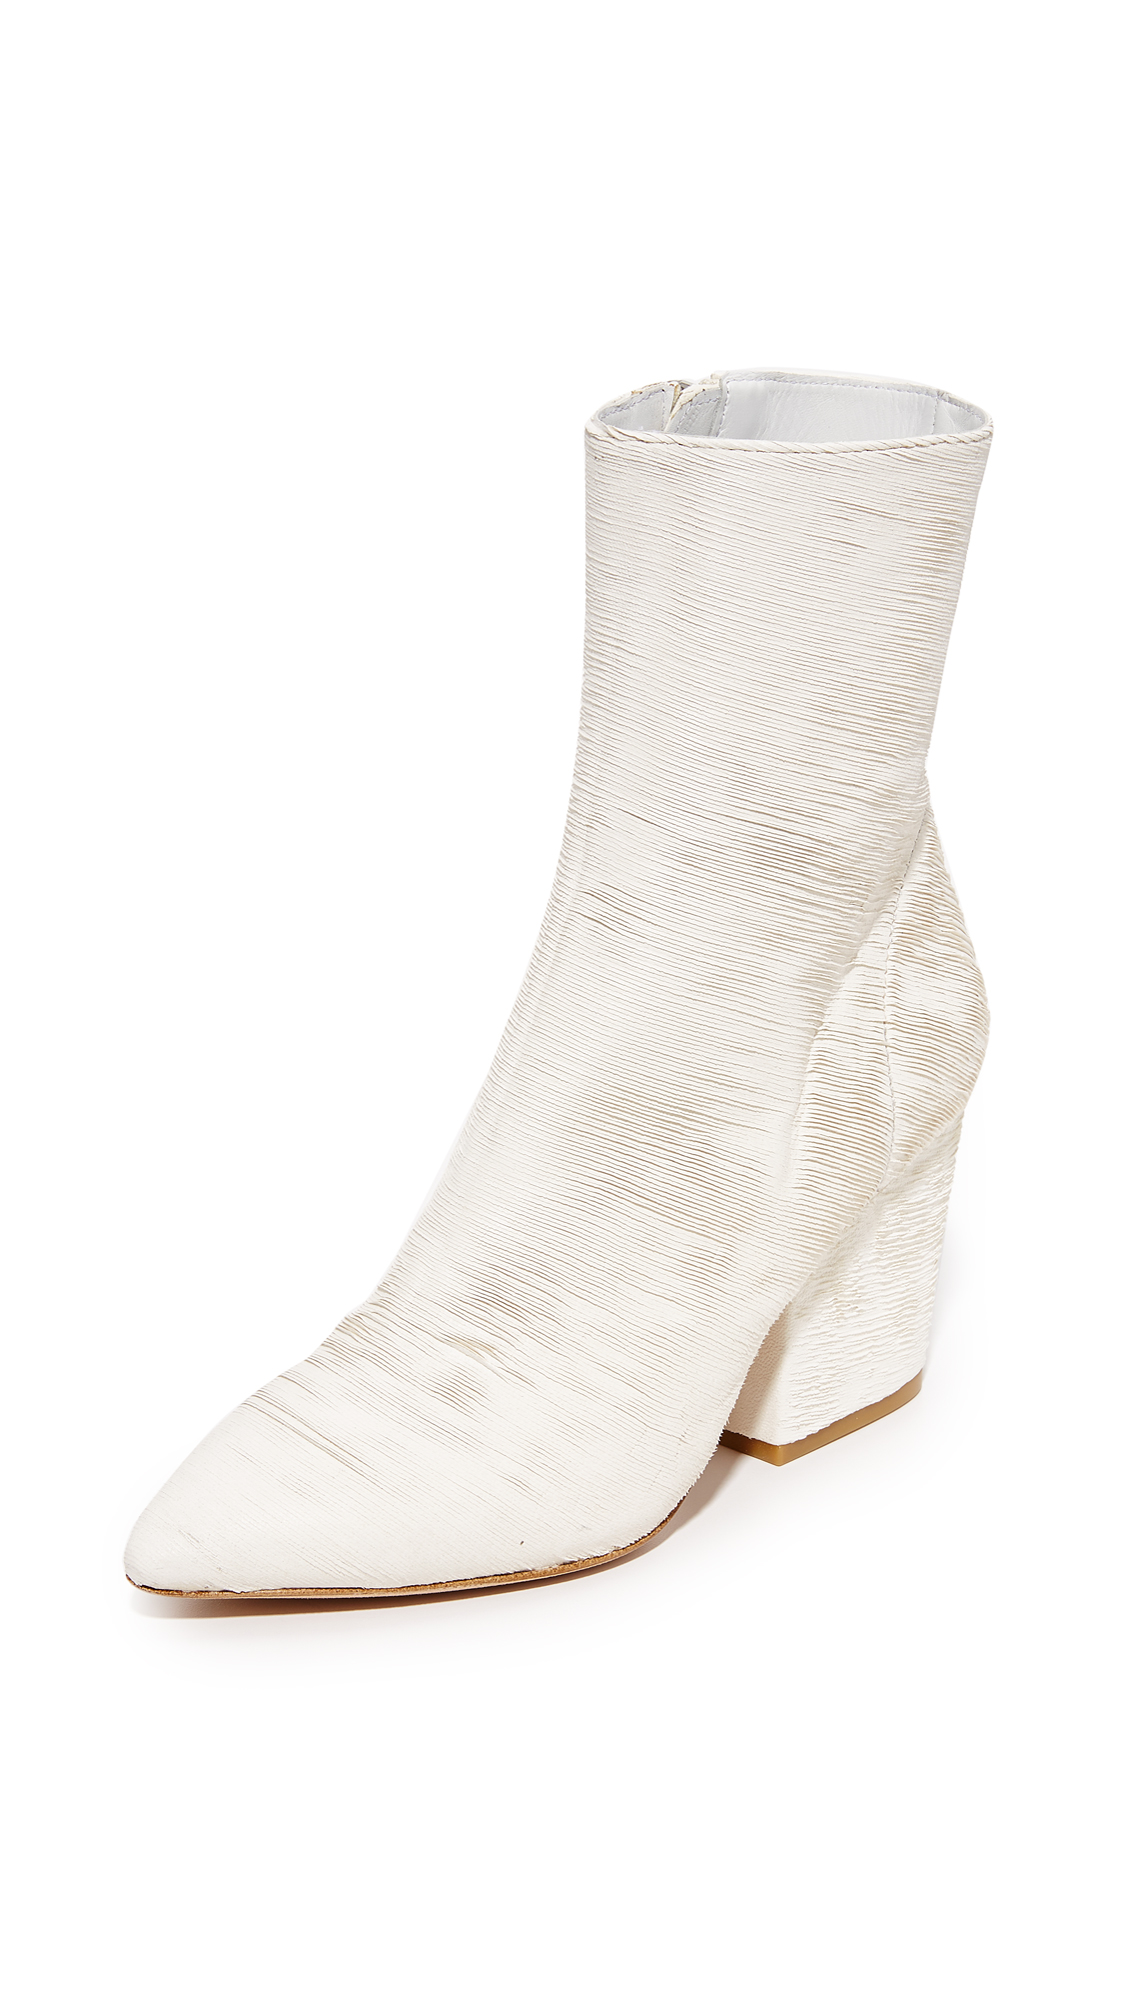 Iro Ladila Booties - Grey/White